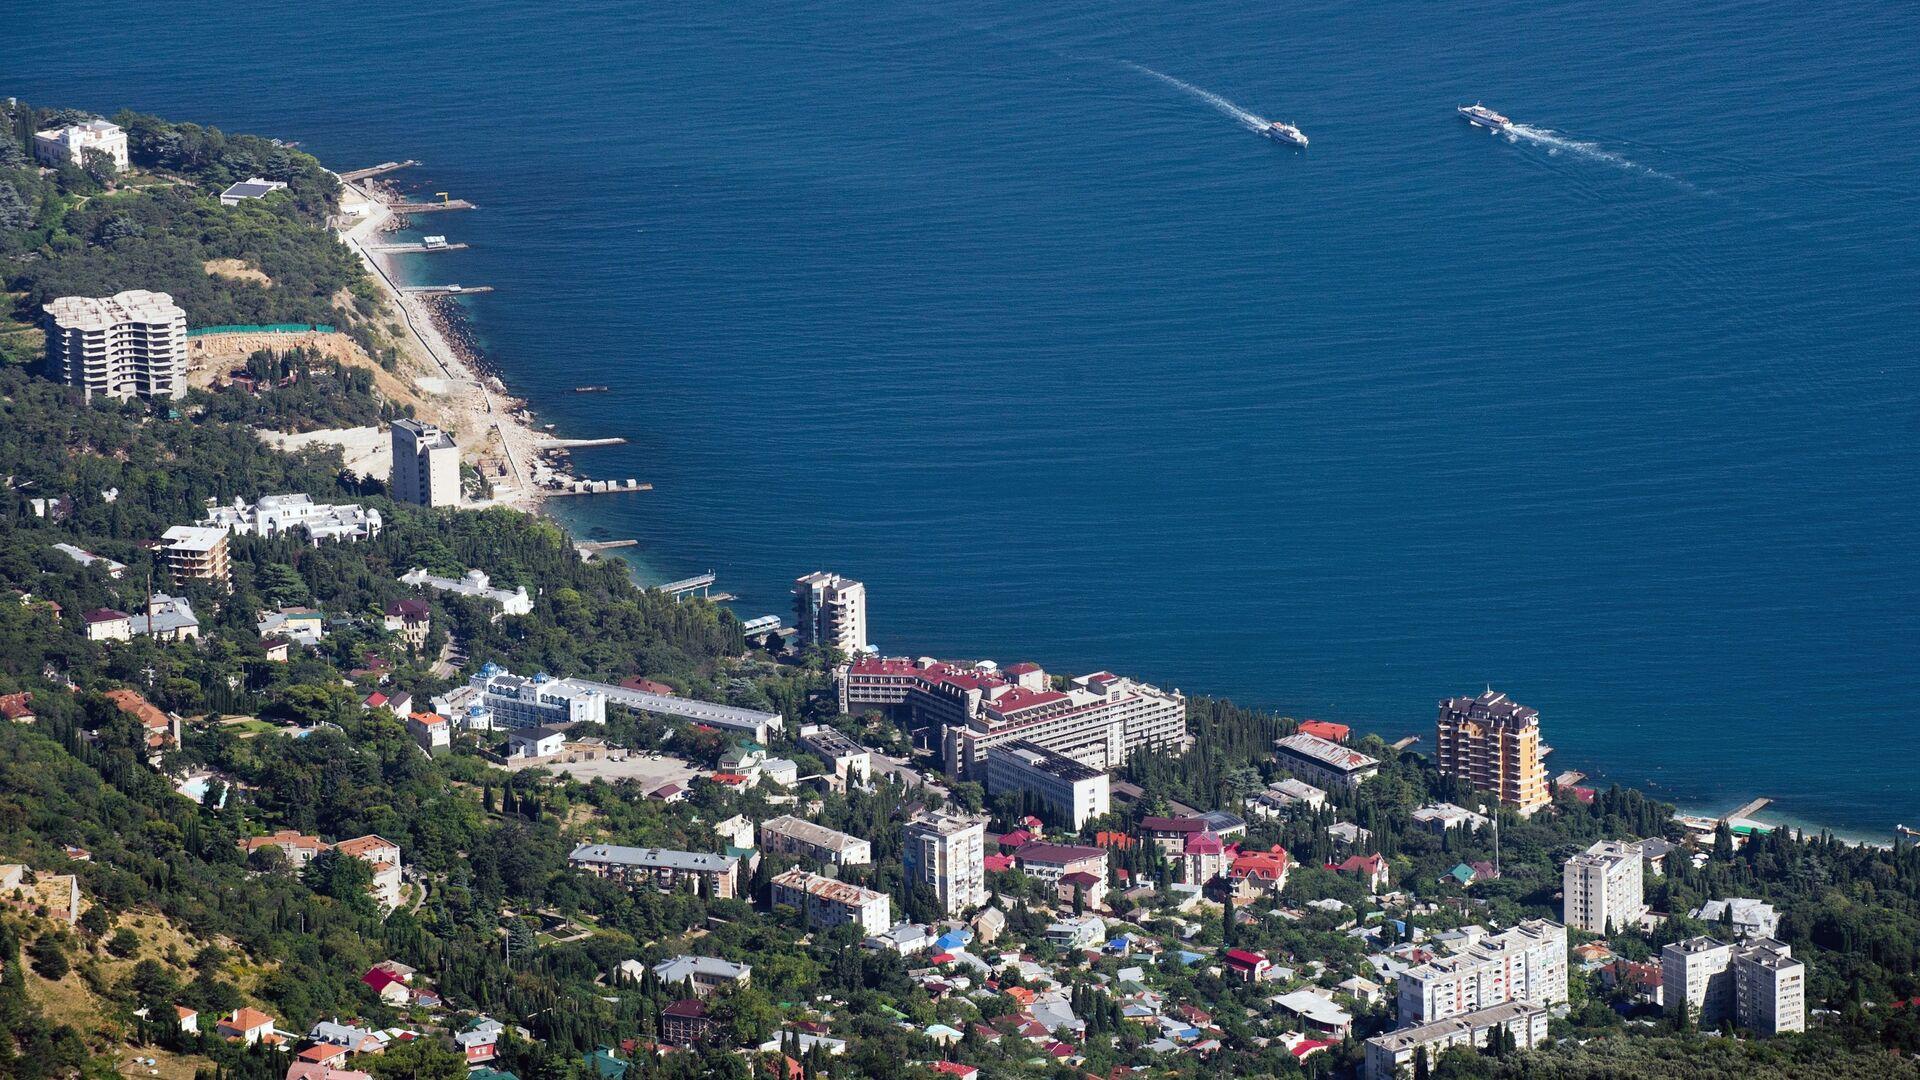 View of the Black Sea shore and the Miskhor village from Ai-Petri Mountain in Crimea - Sputnik International, 1920, 21.09.2021